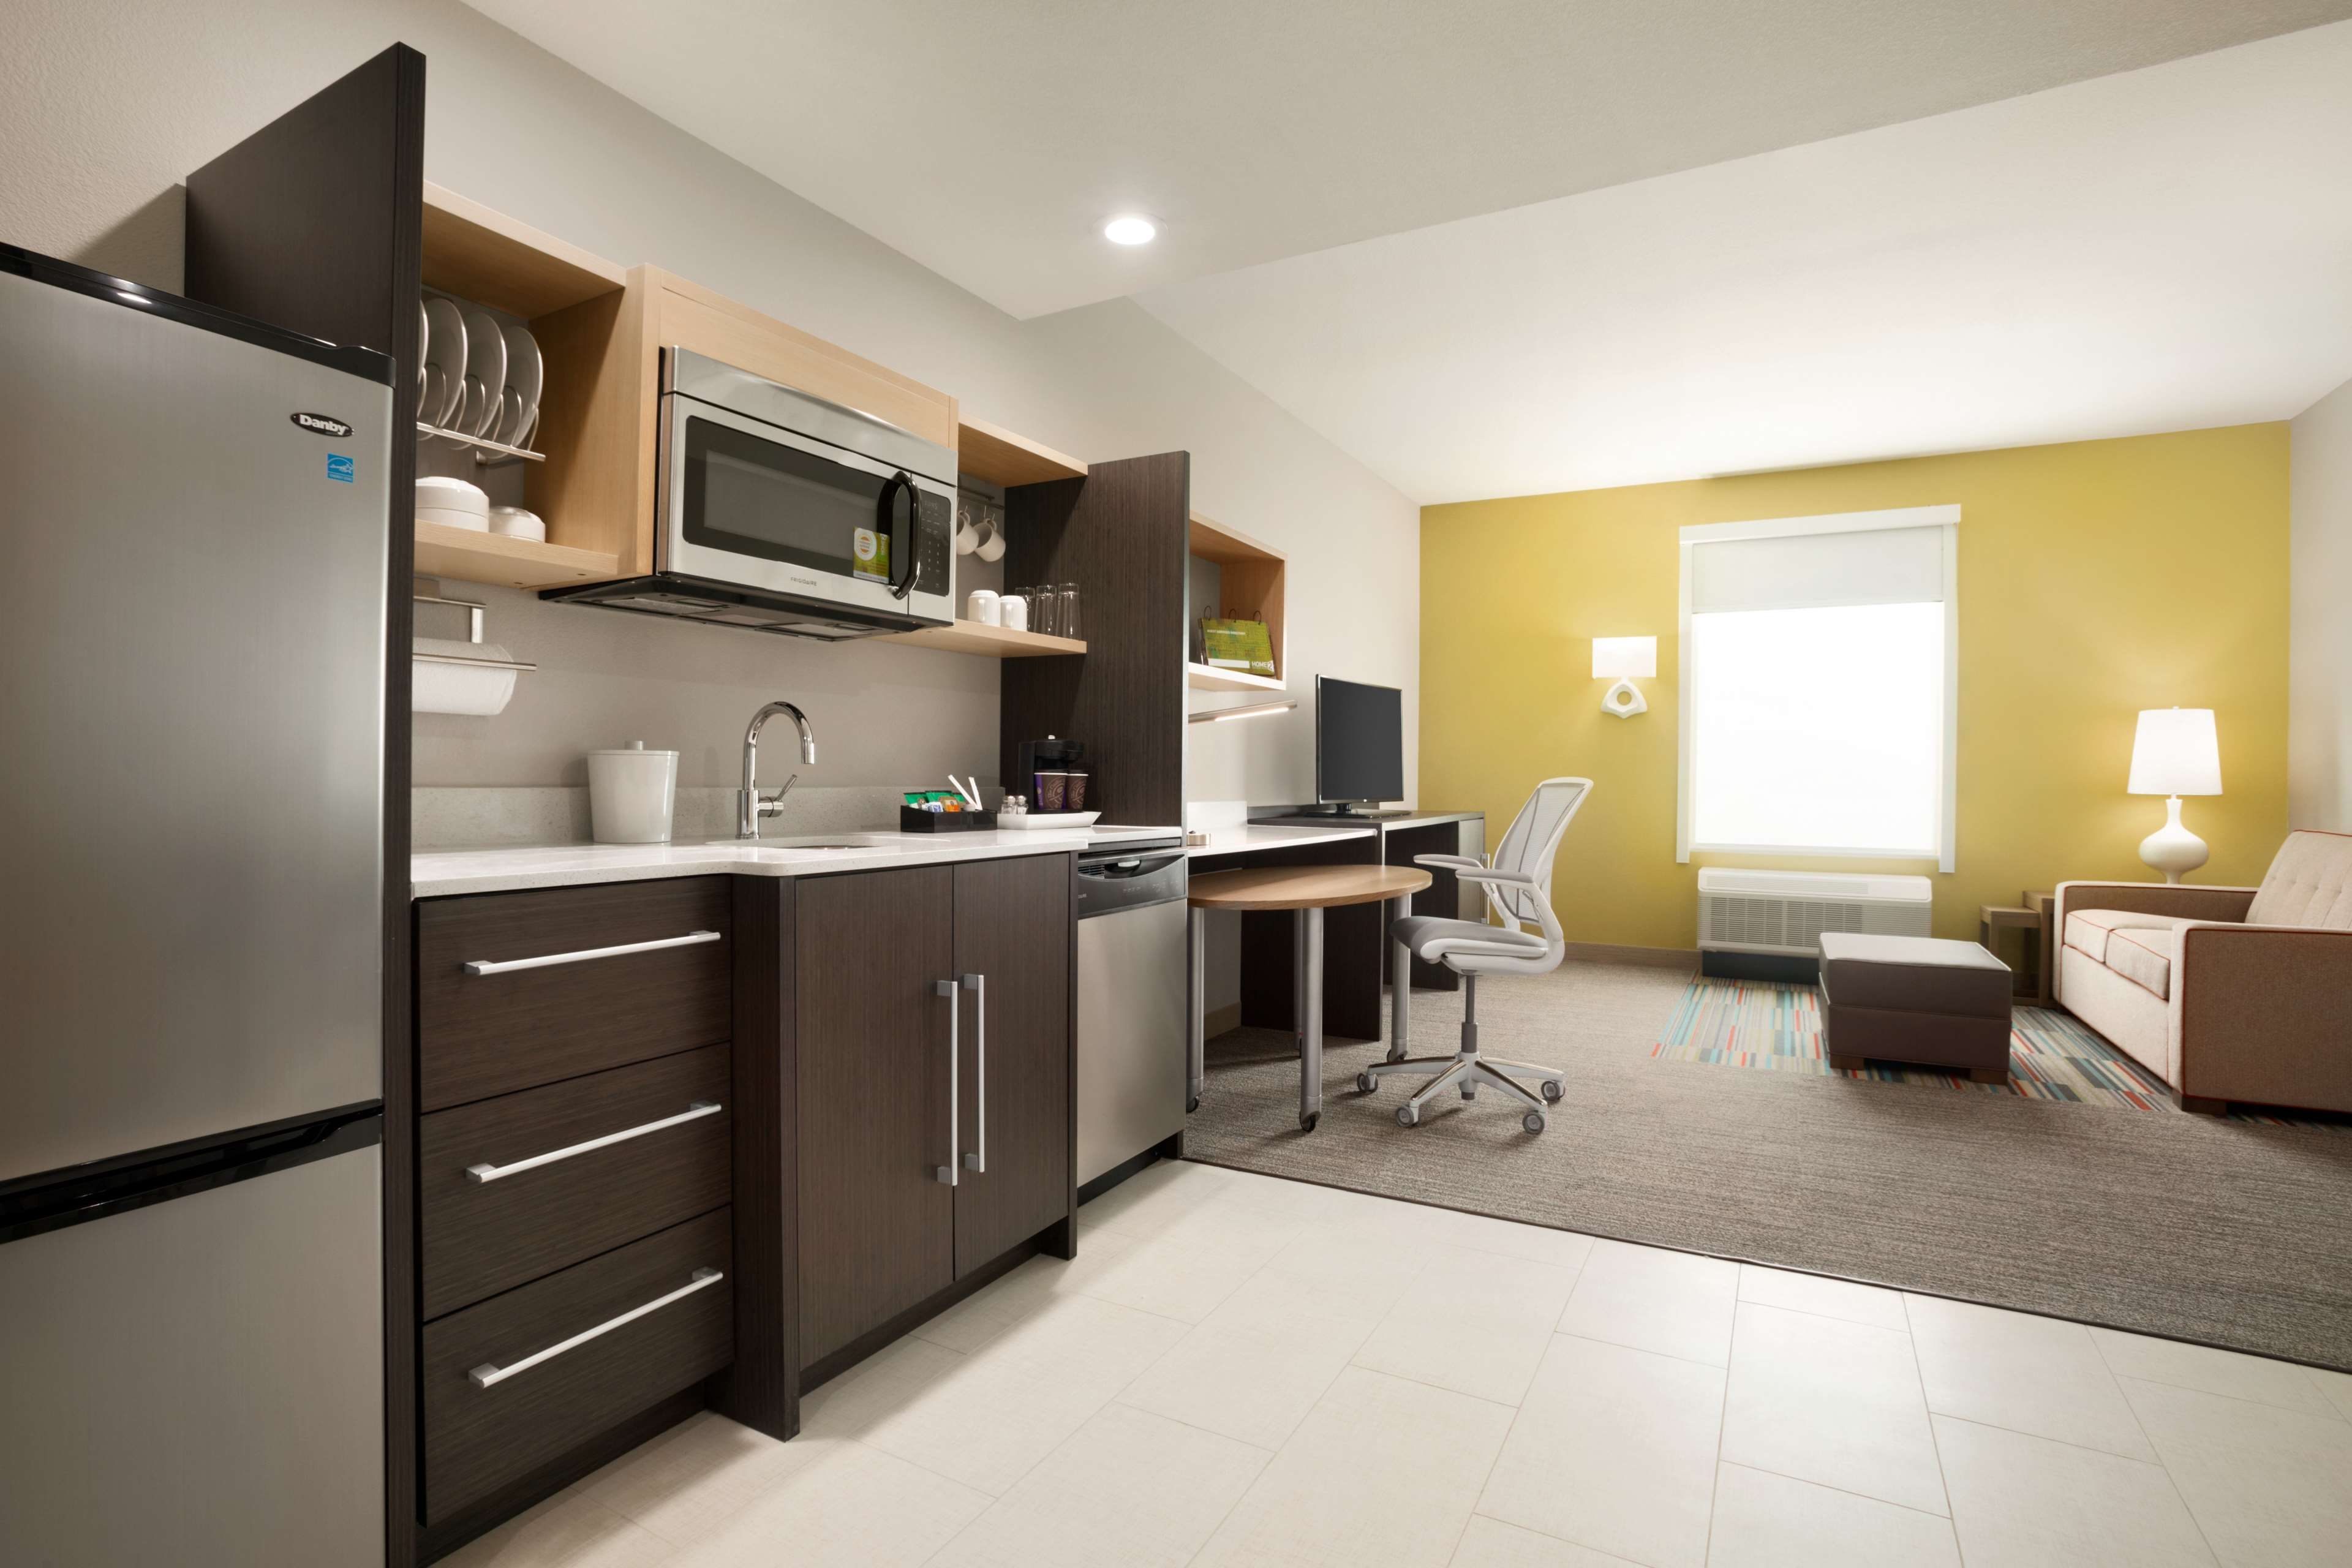 Home2 Suites by Hilton Houston/Webster image 11